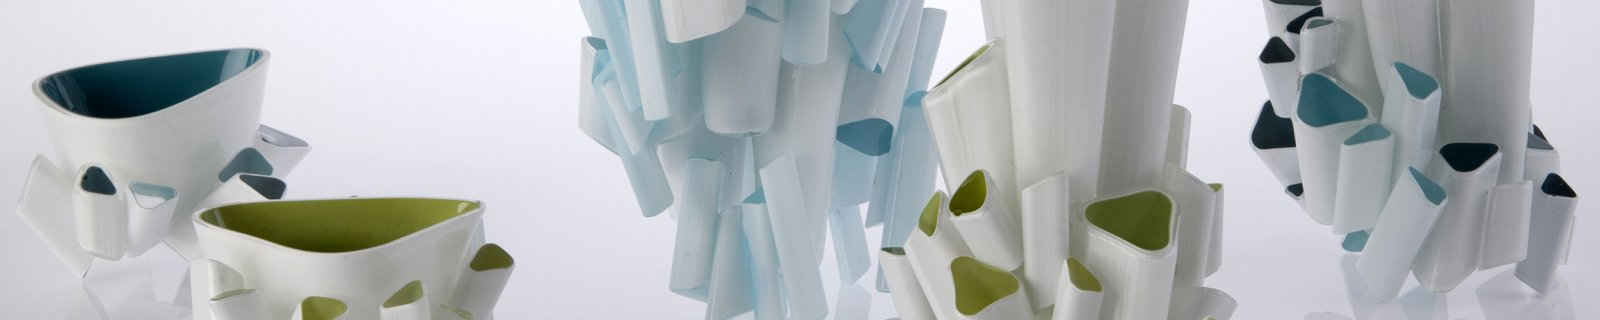 Crescita Range by Kristel Britcher, New Glass Review 37